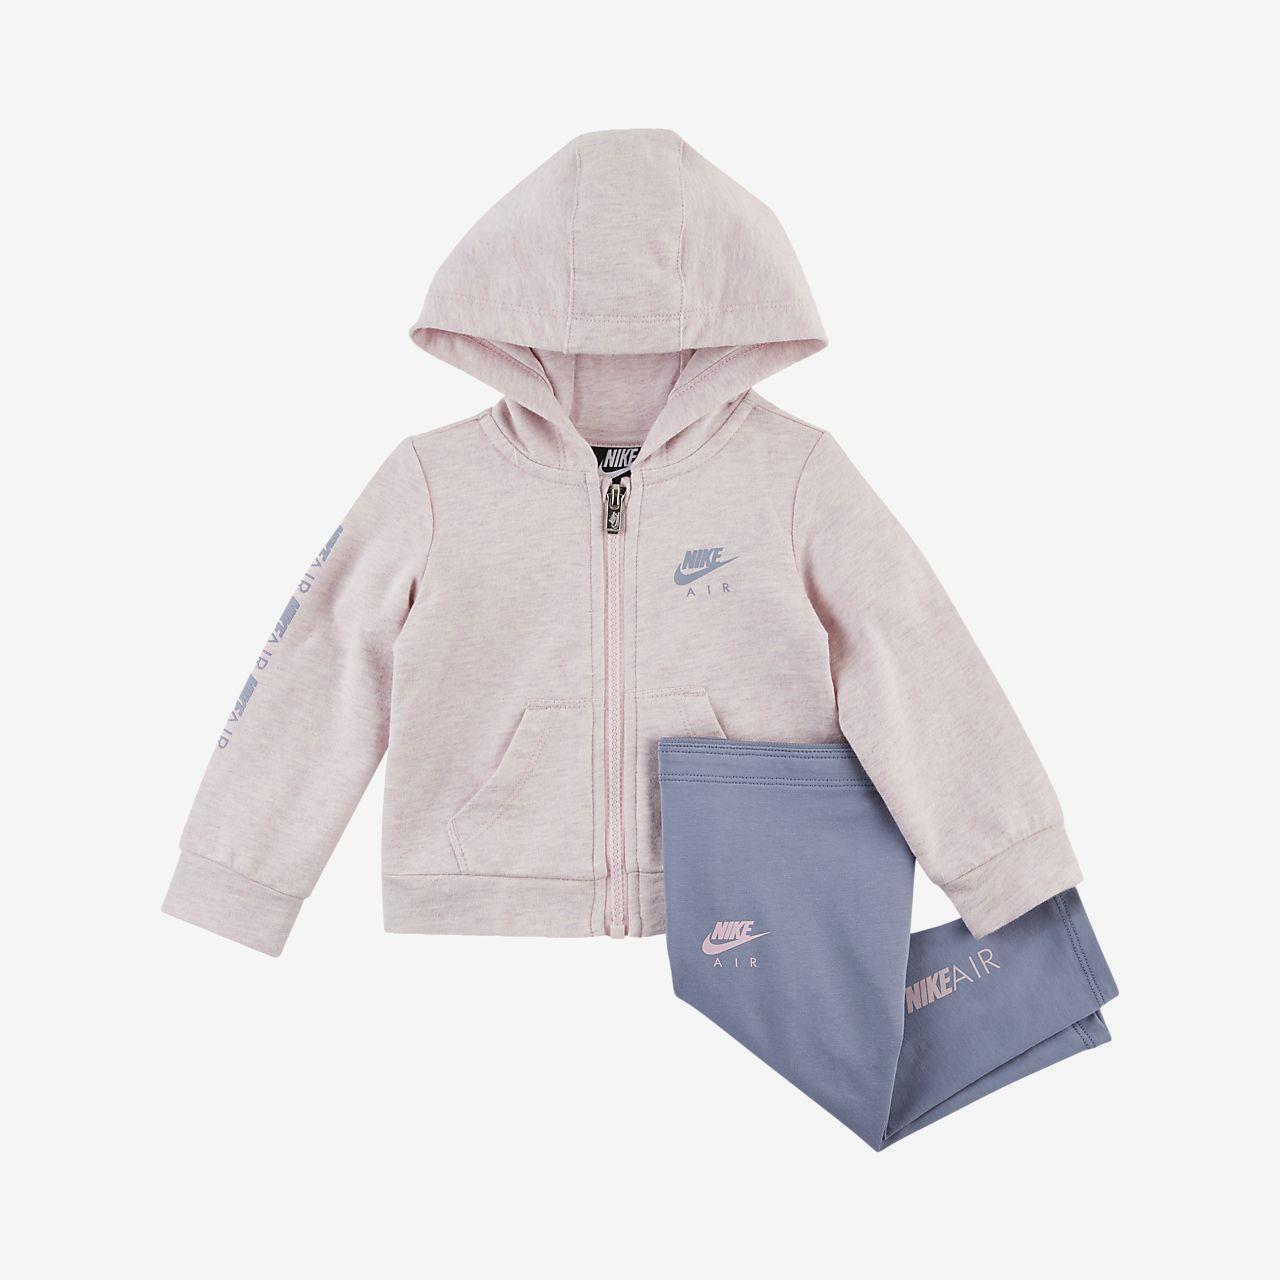 Conjunto de 2 peças Nike Sportswear para bebé (12-24 M)